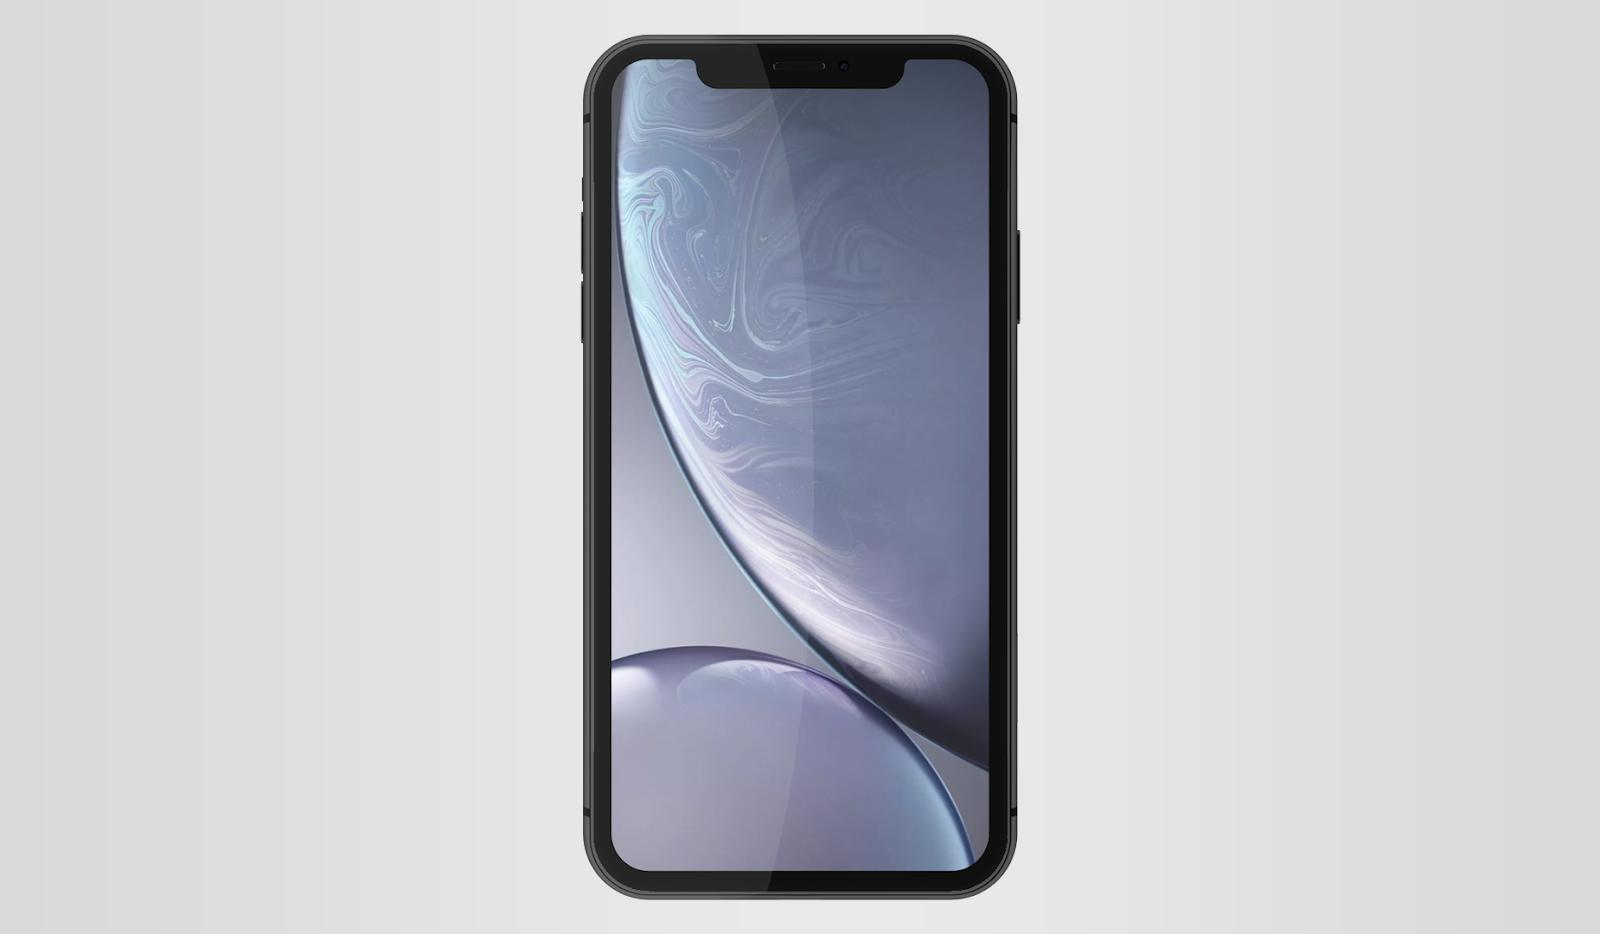 Apple Iphone Xr 3d Model A 3d Model Closer To Reality Apple Iphone Iphone Apple